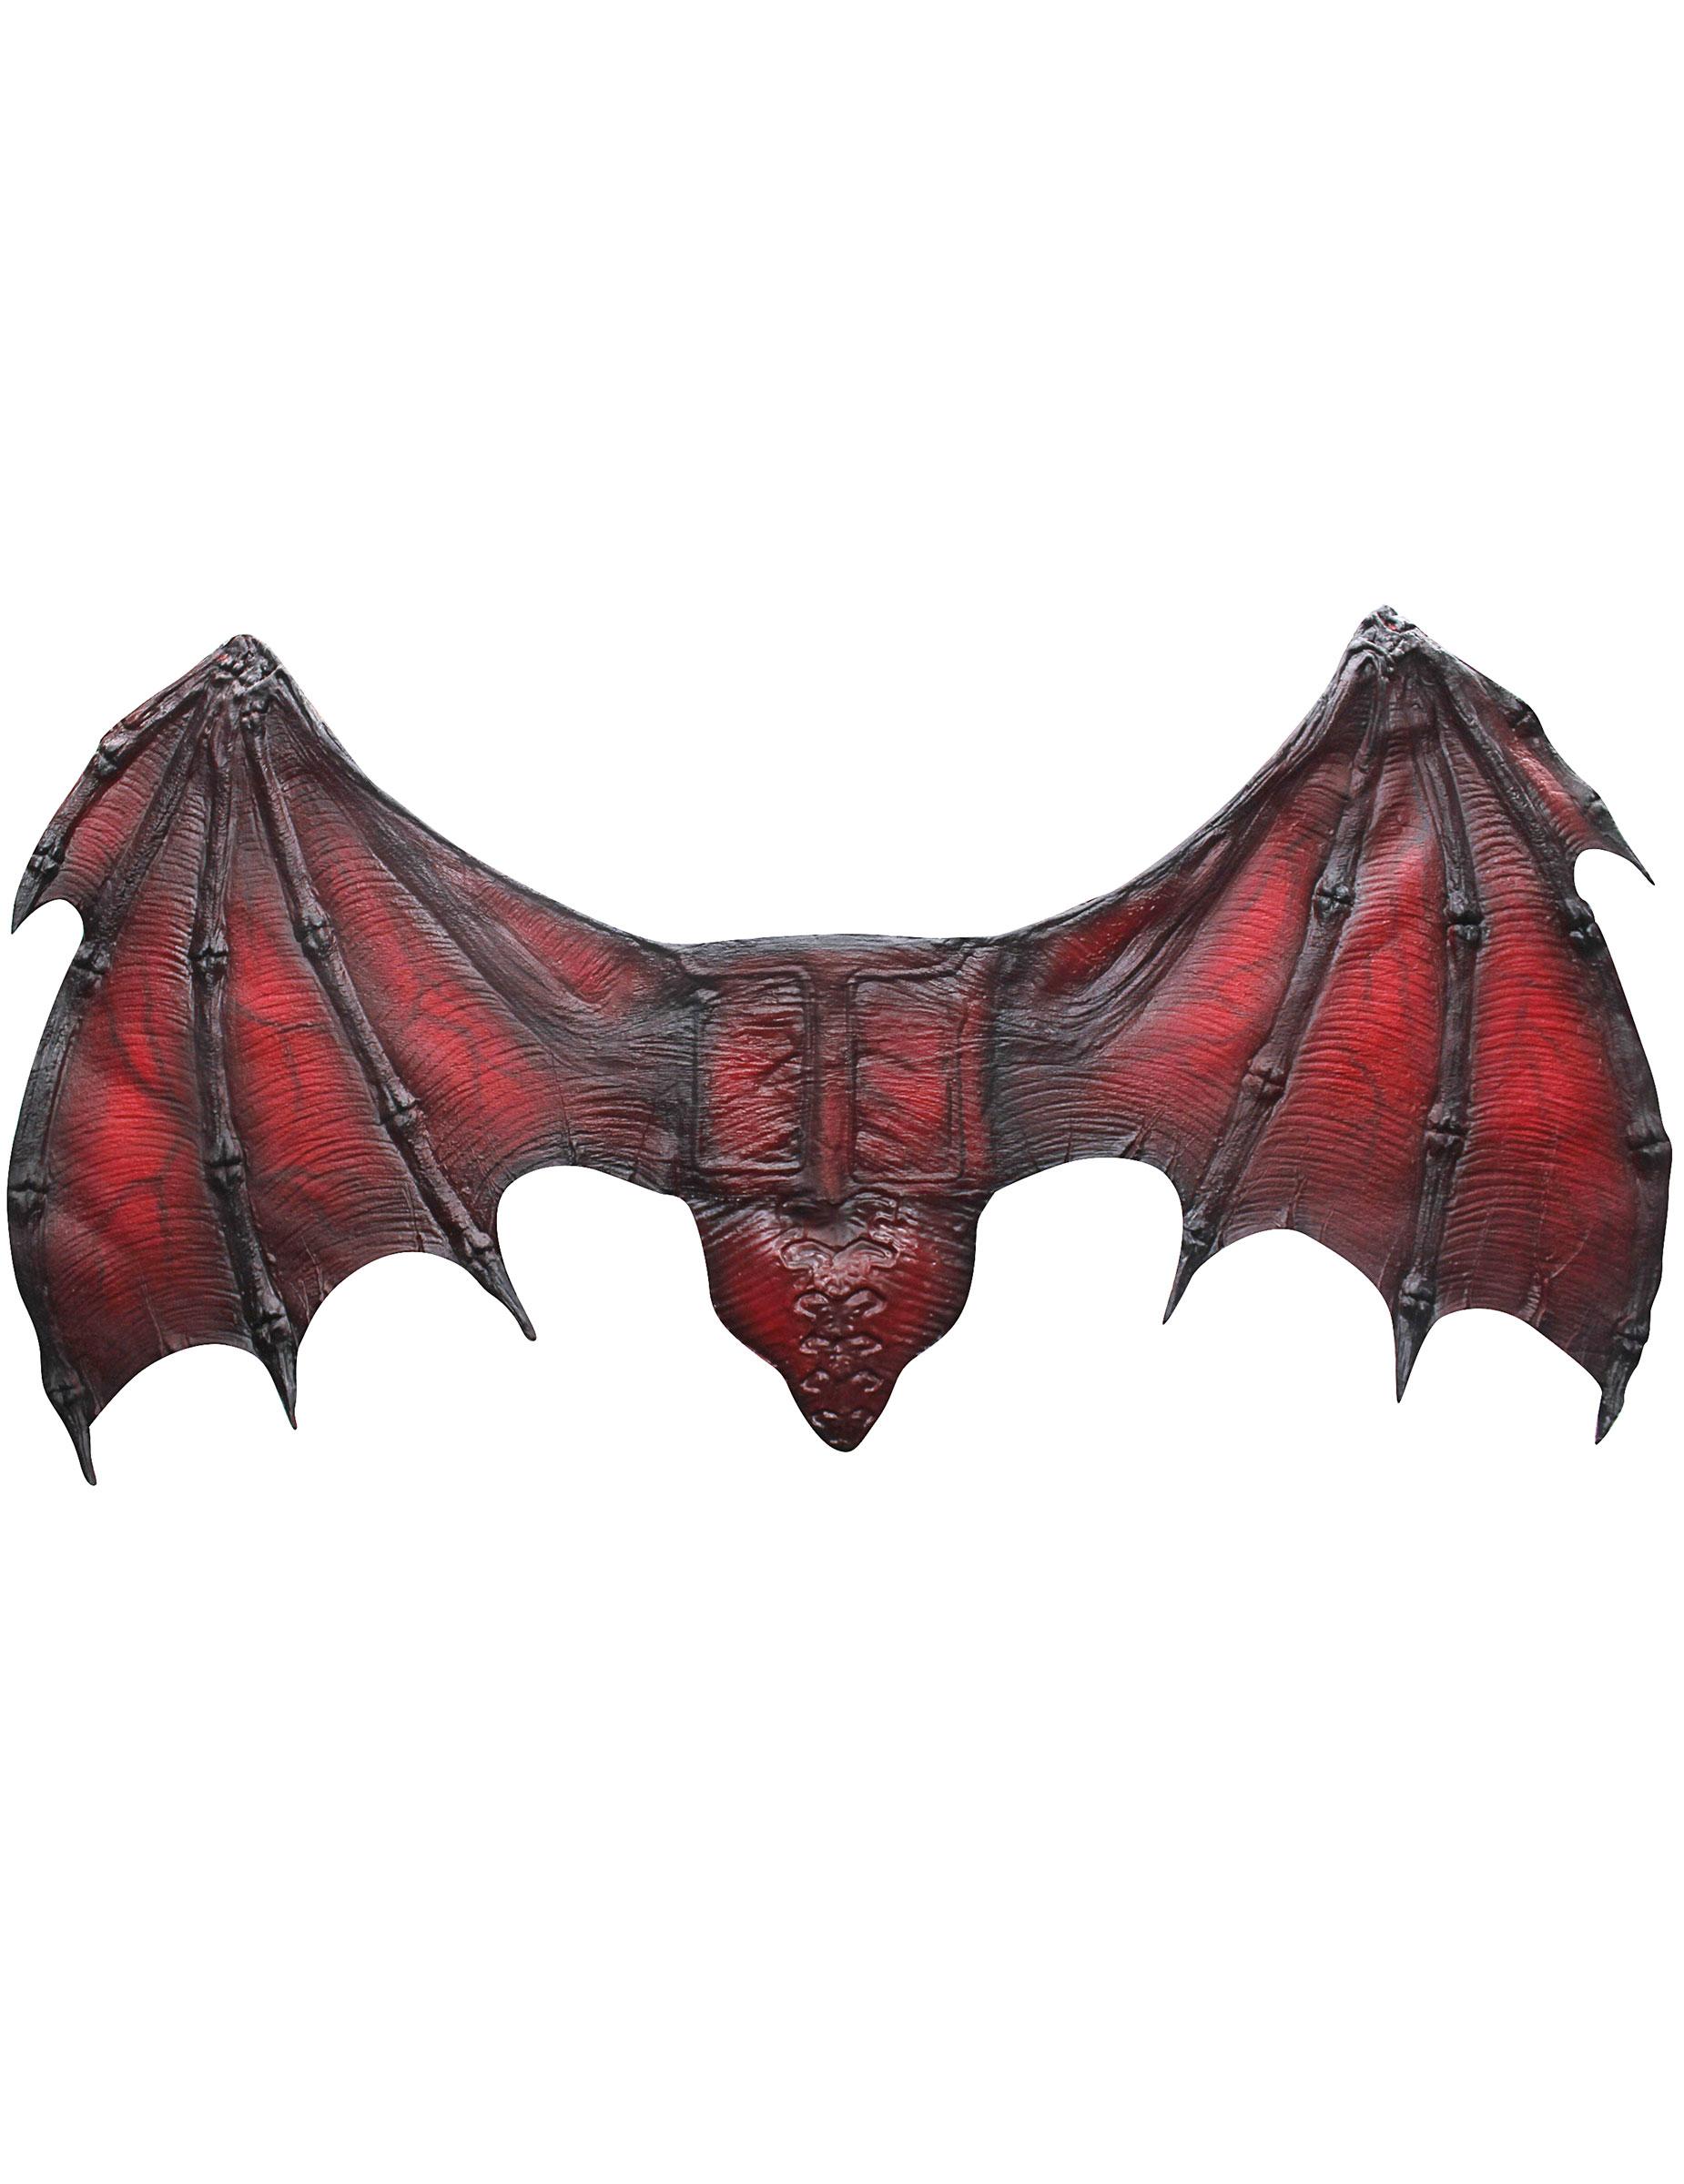 Ailes diable halloween deguise toi achat de accessoires - Deguisetoi fr halloween ...